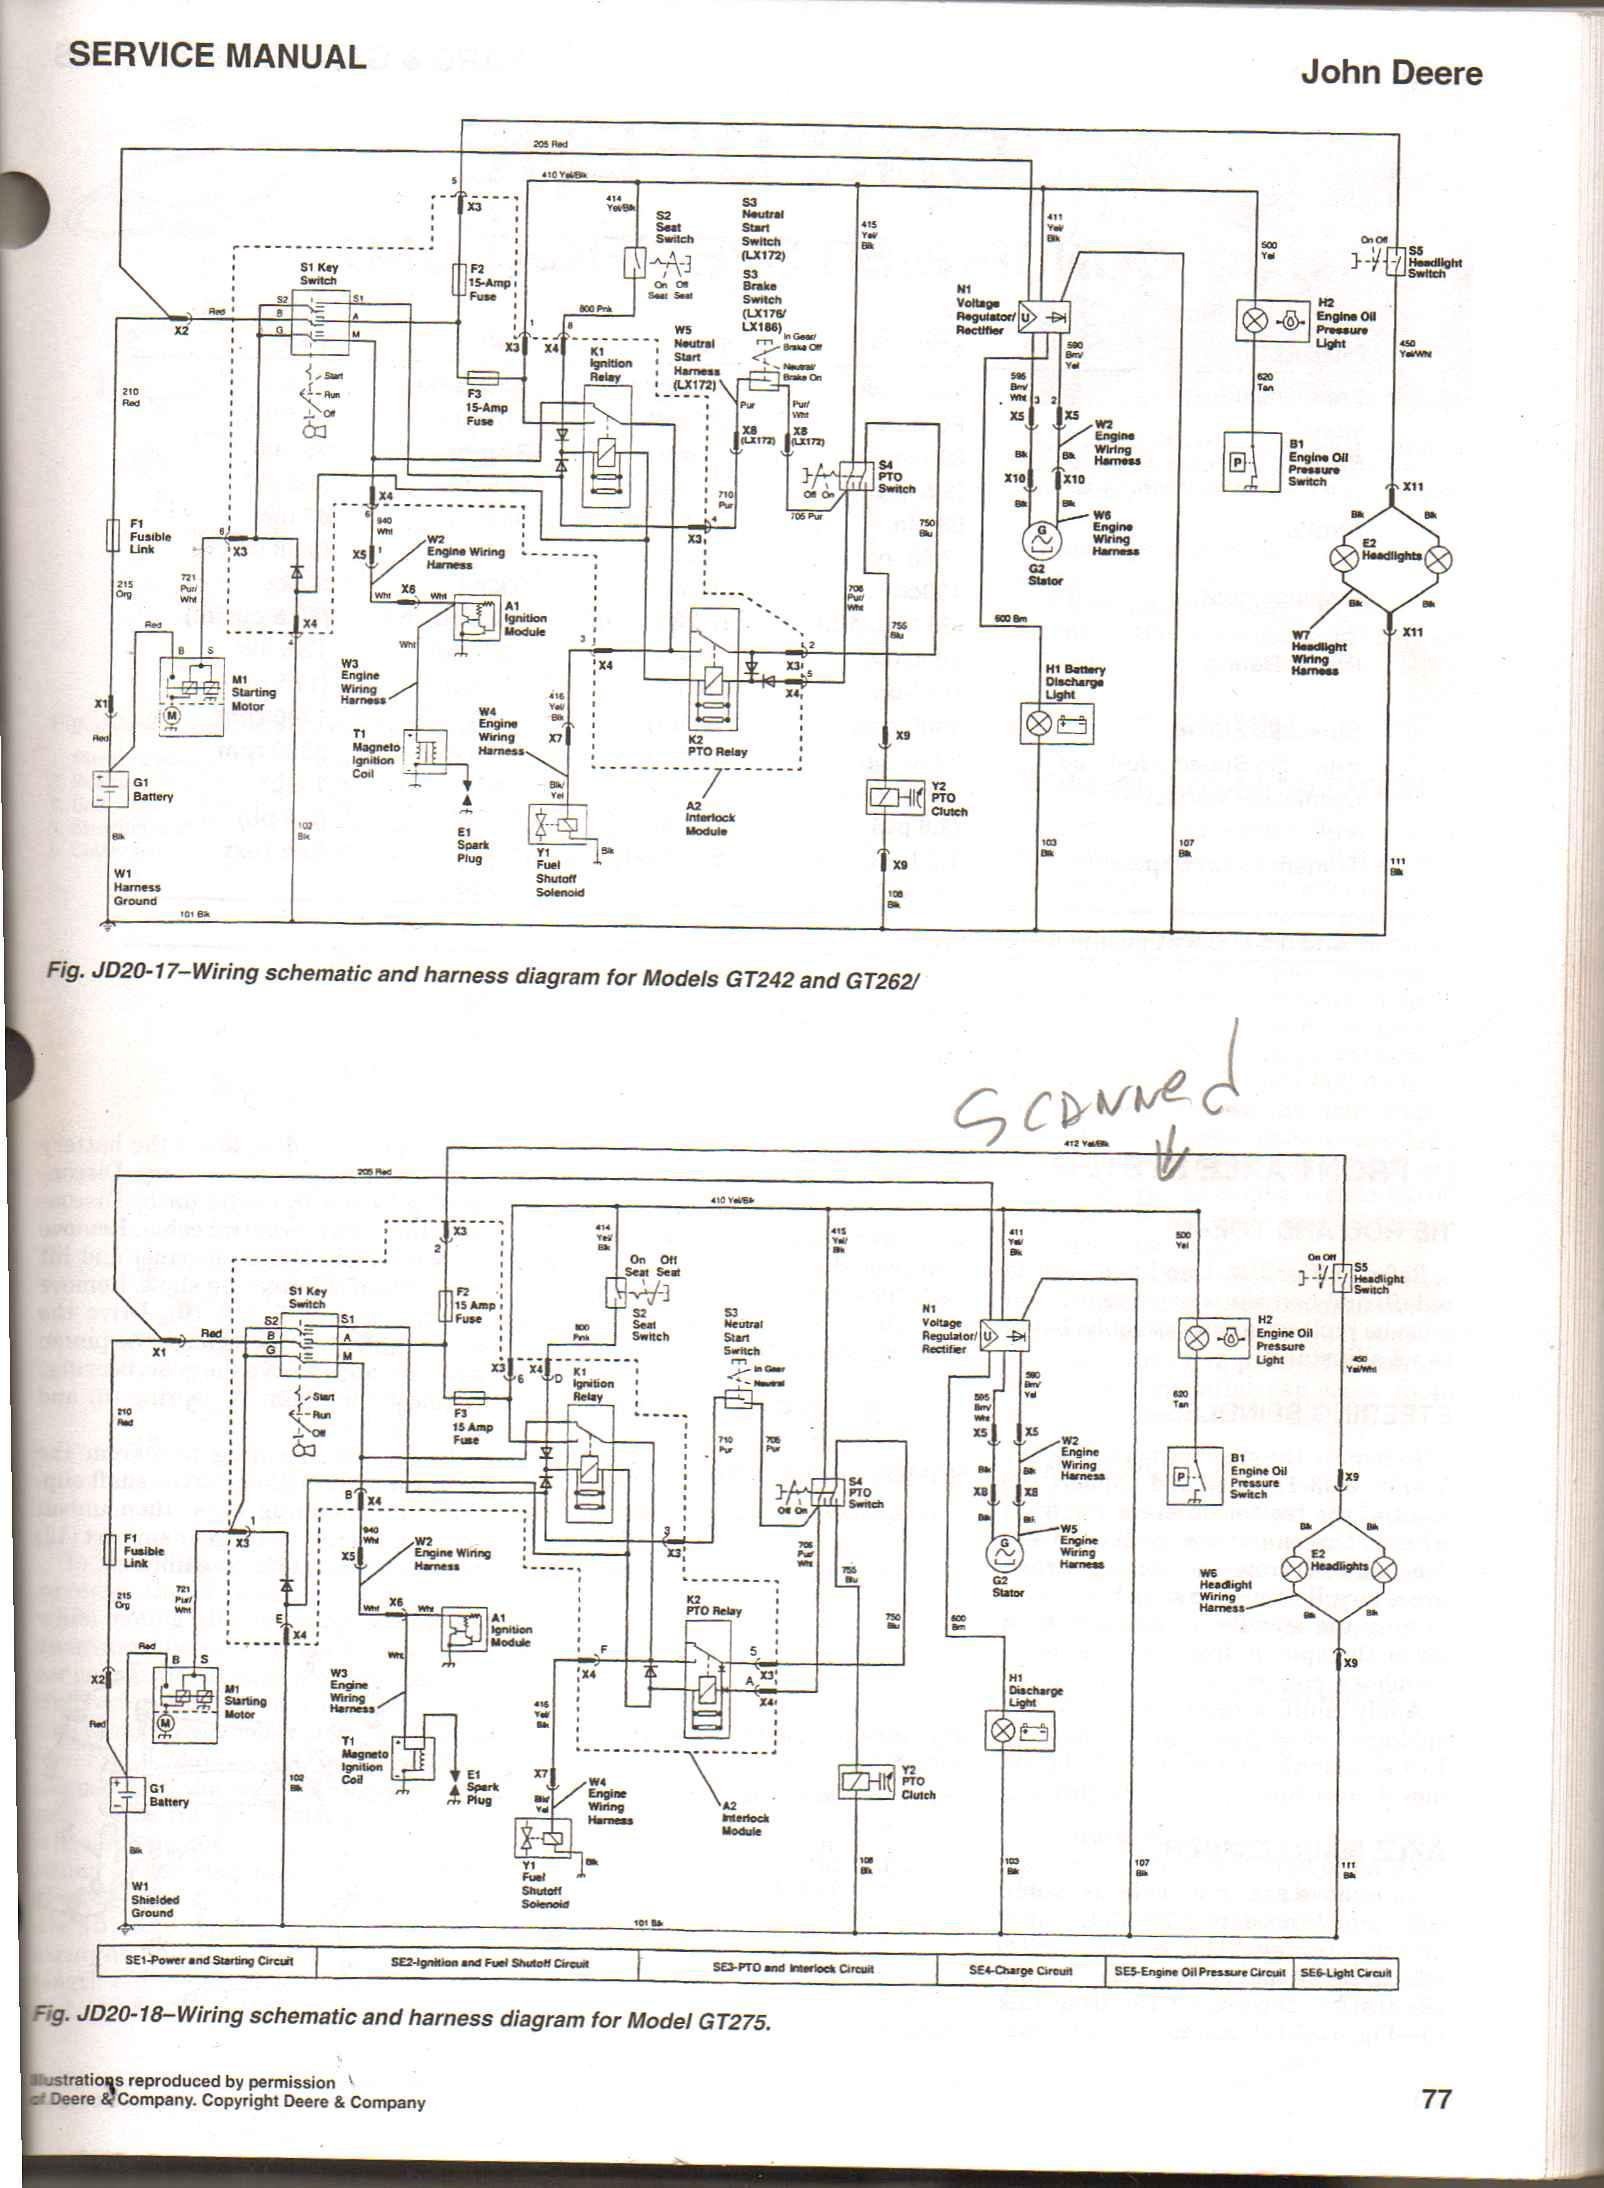 john deere ignition switch diagram john image john deer gt 262 will not start when key is turned on no on john deere john deere gx75 wiring diagram